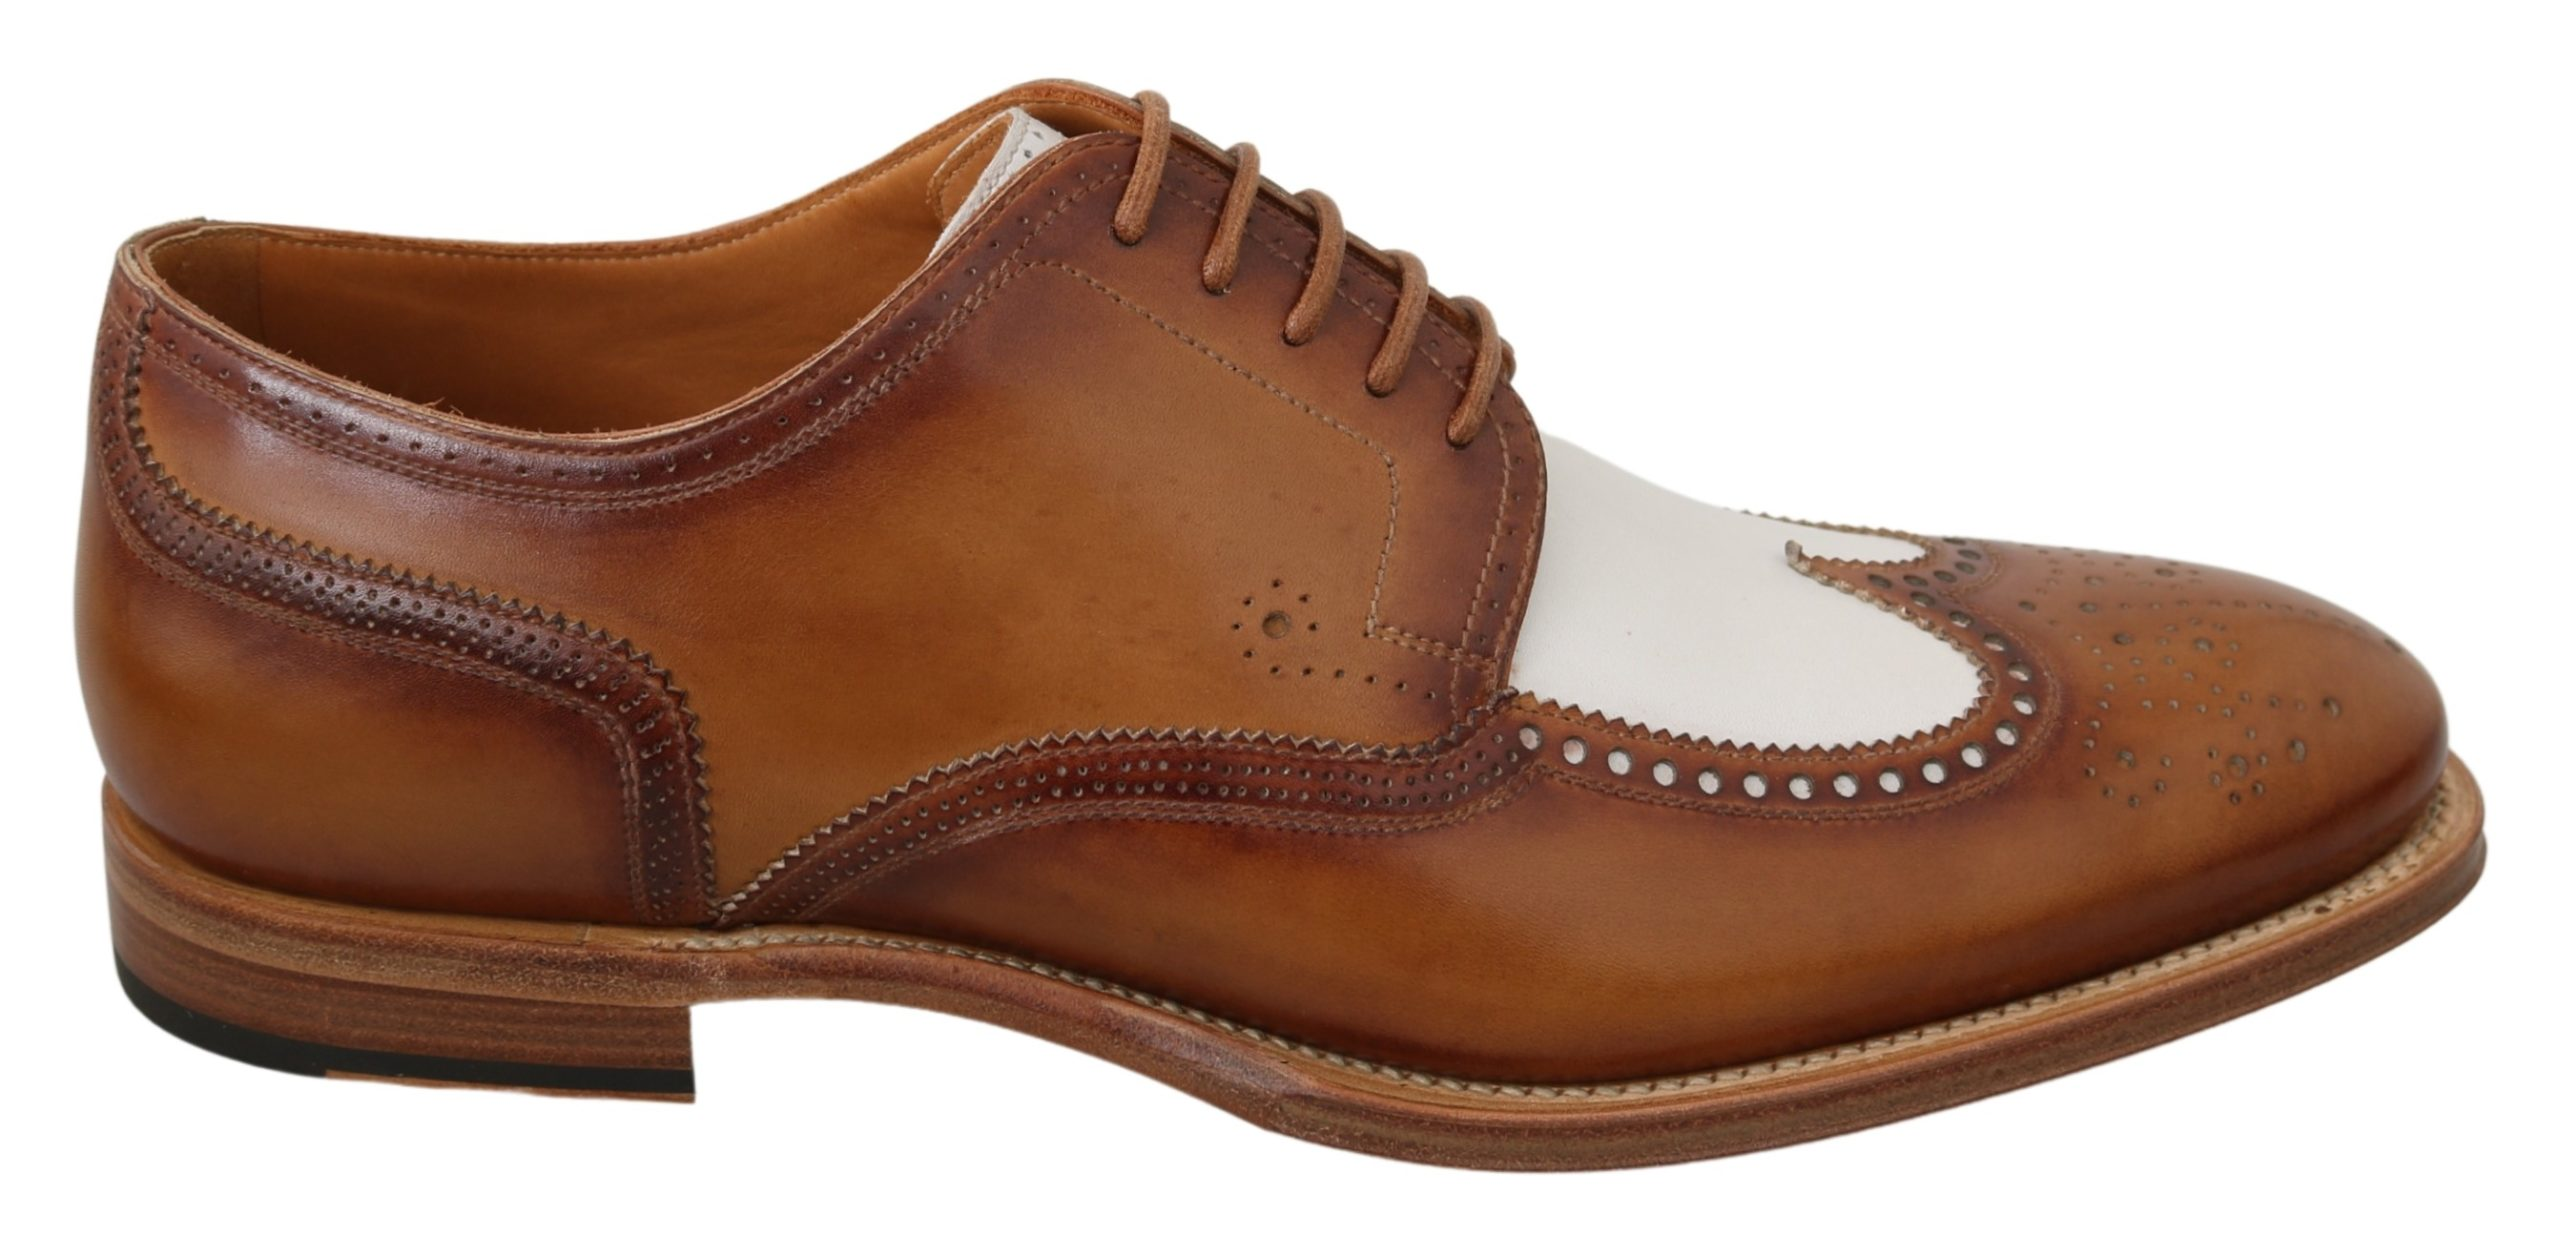 Dolce & Gabbana Men's Leather Brogue Shoe Brown MV2883 - EU44/US11